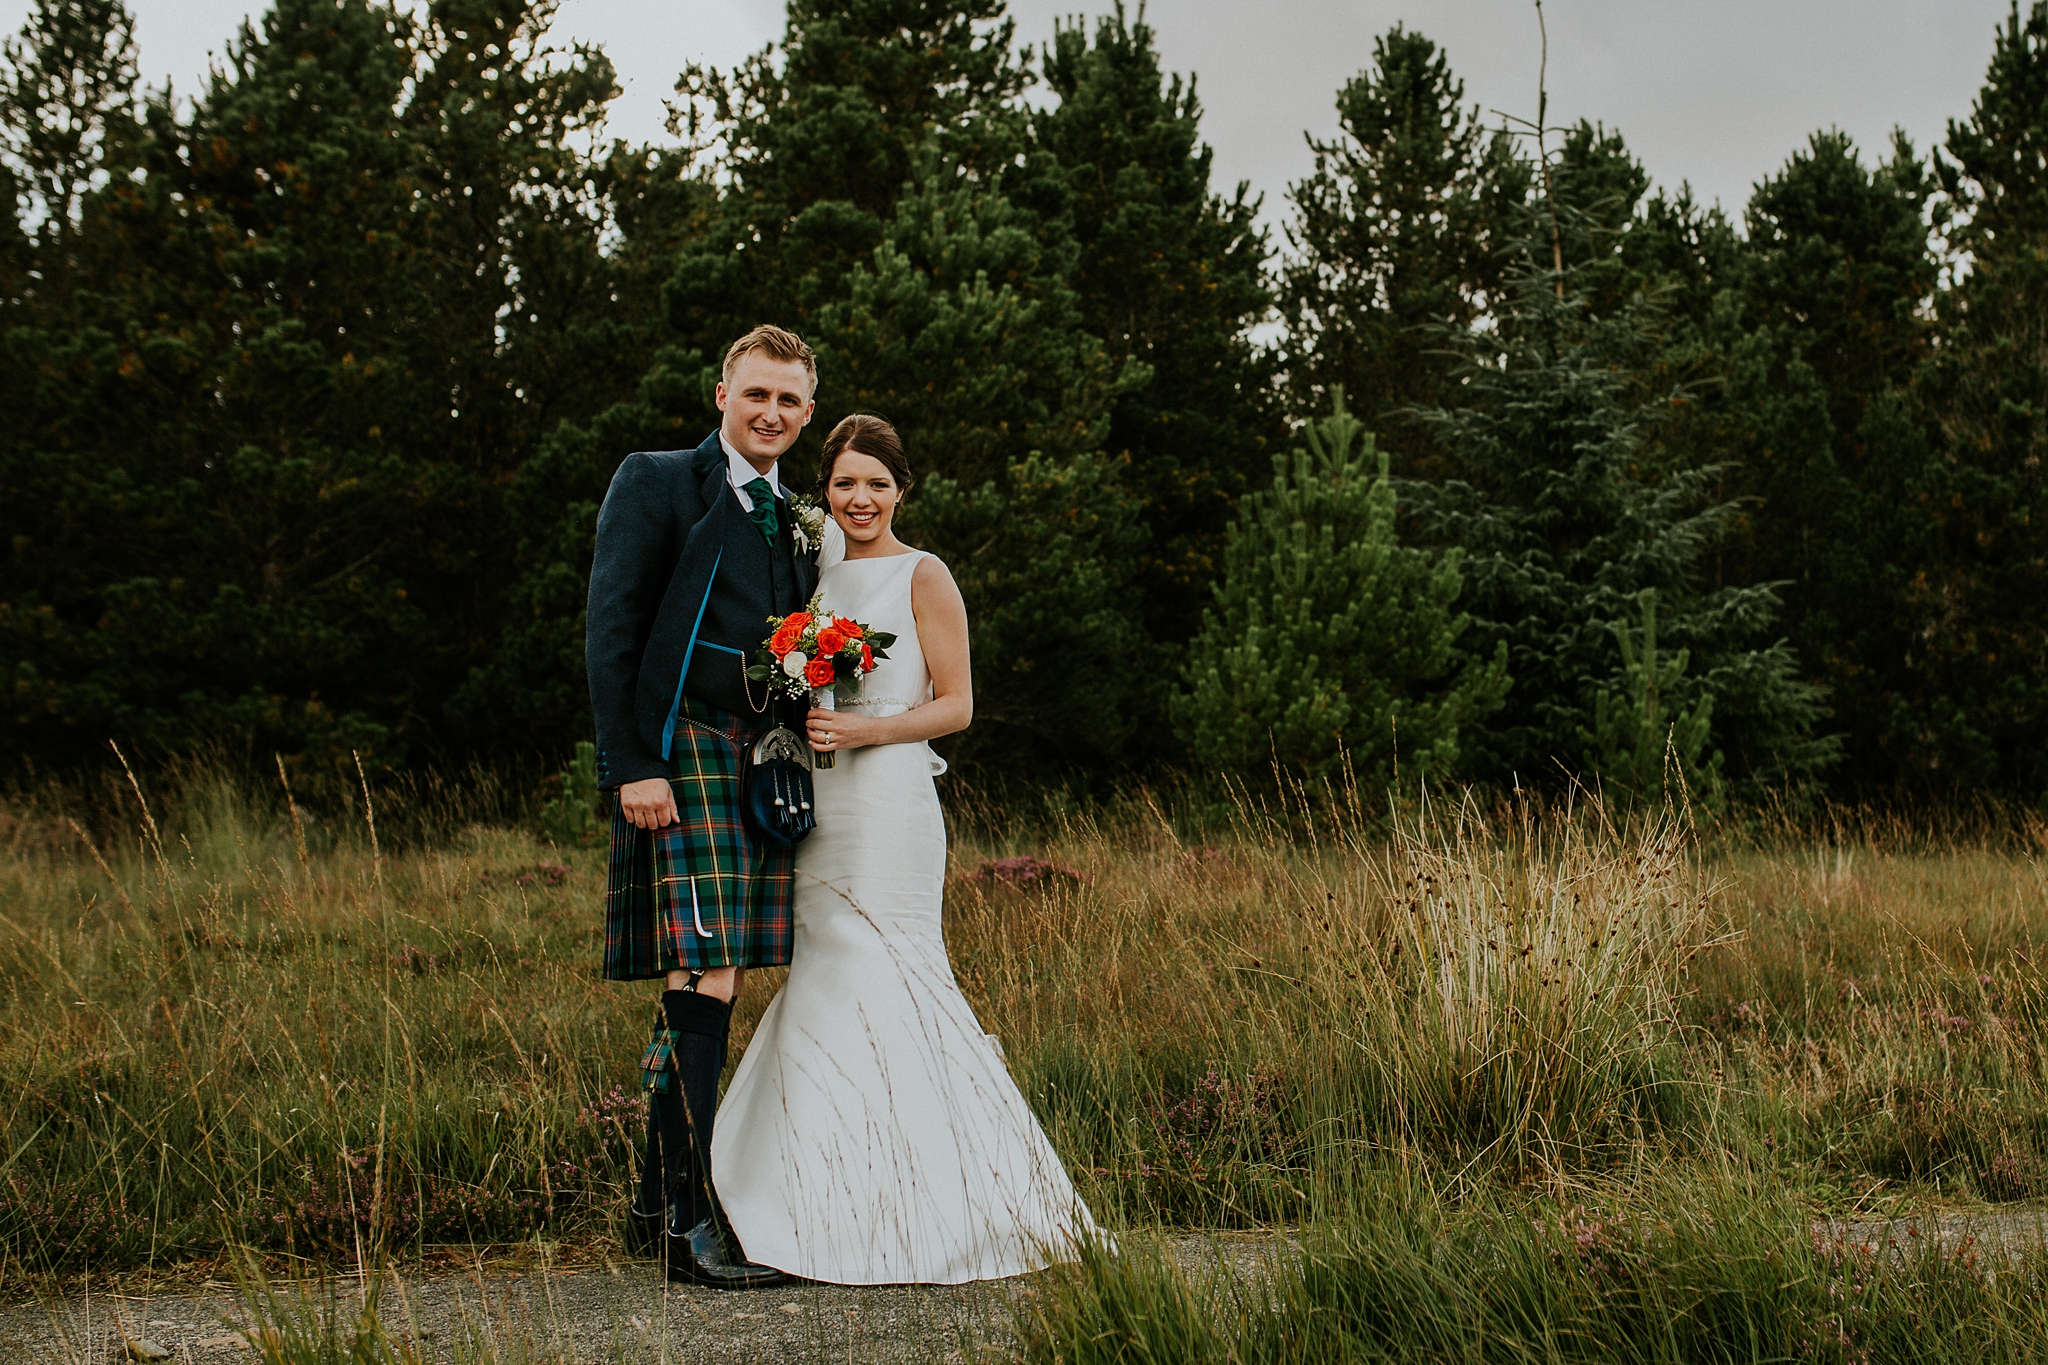 Linda&Shockie_northuist_wedding_photographer-42.JPG